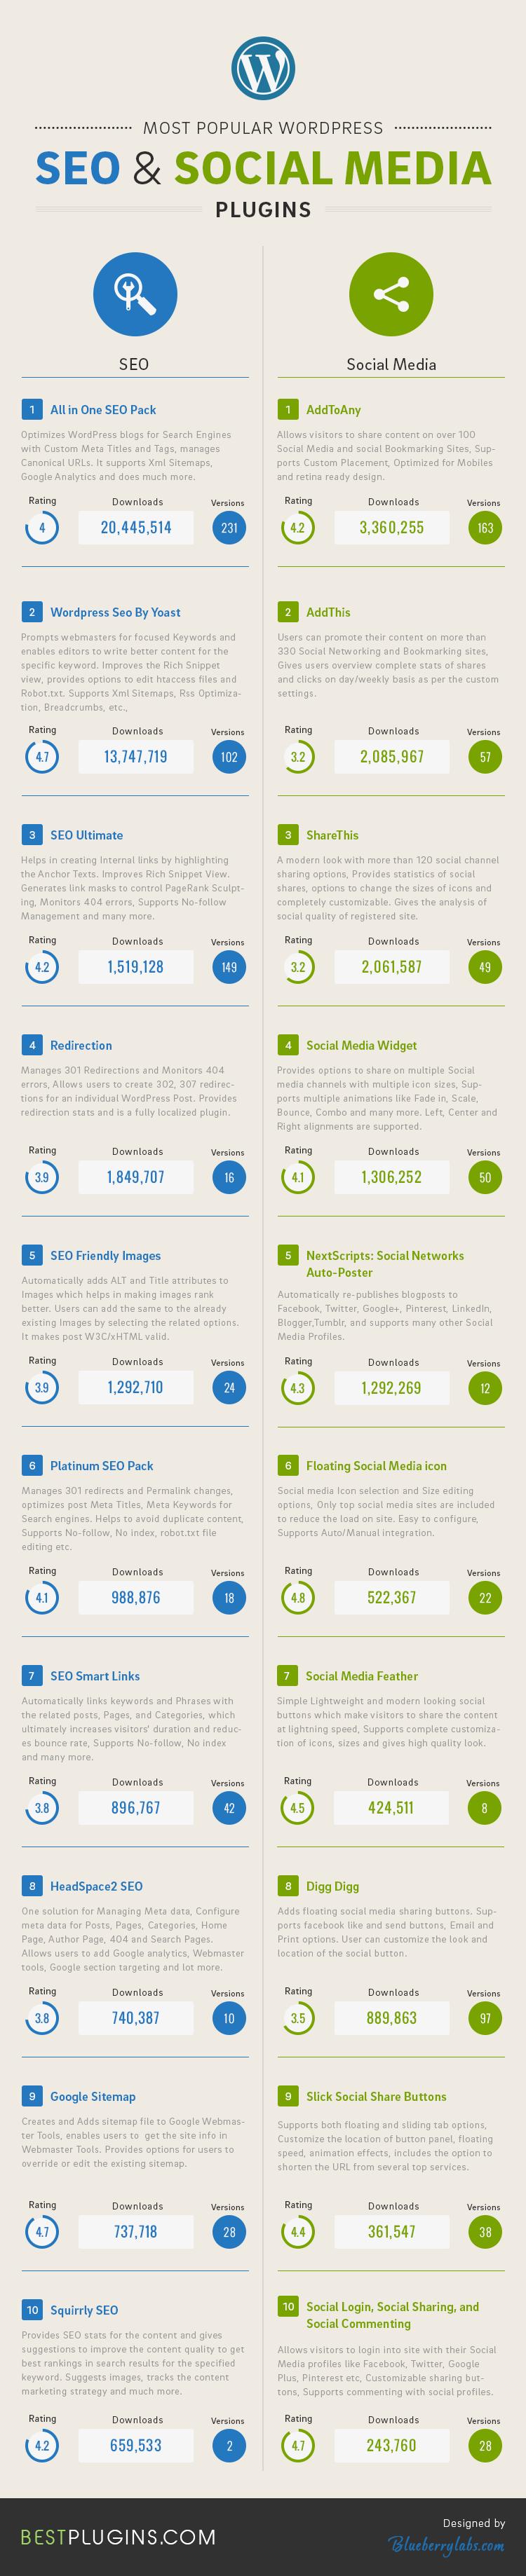 Most-Popular-WordPress-Seo-and-social-media-plugins